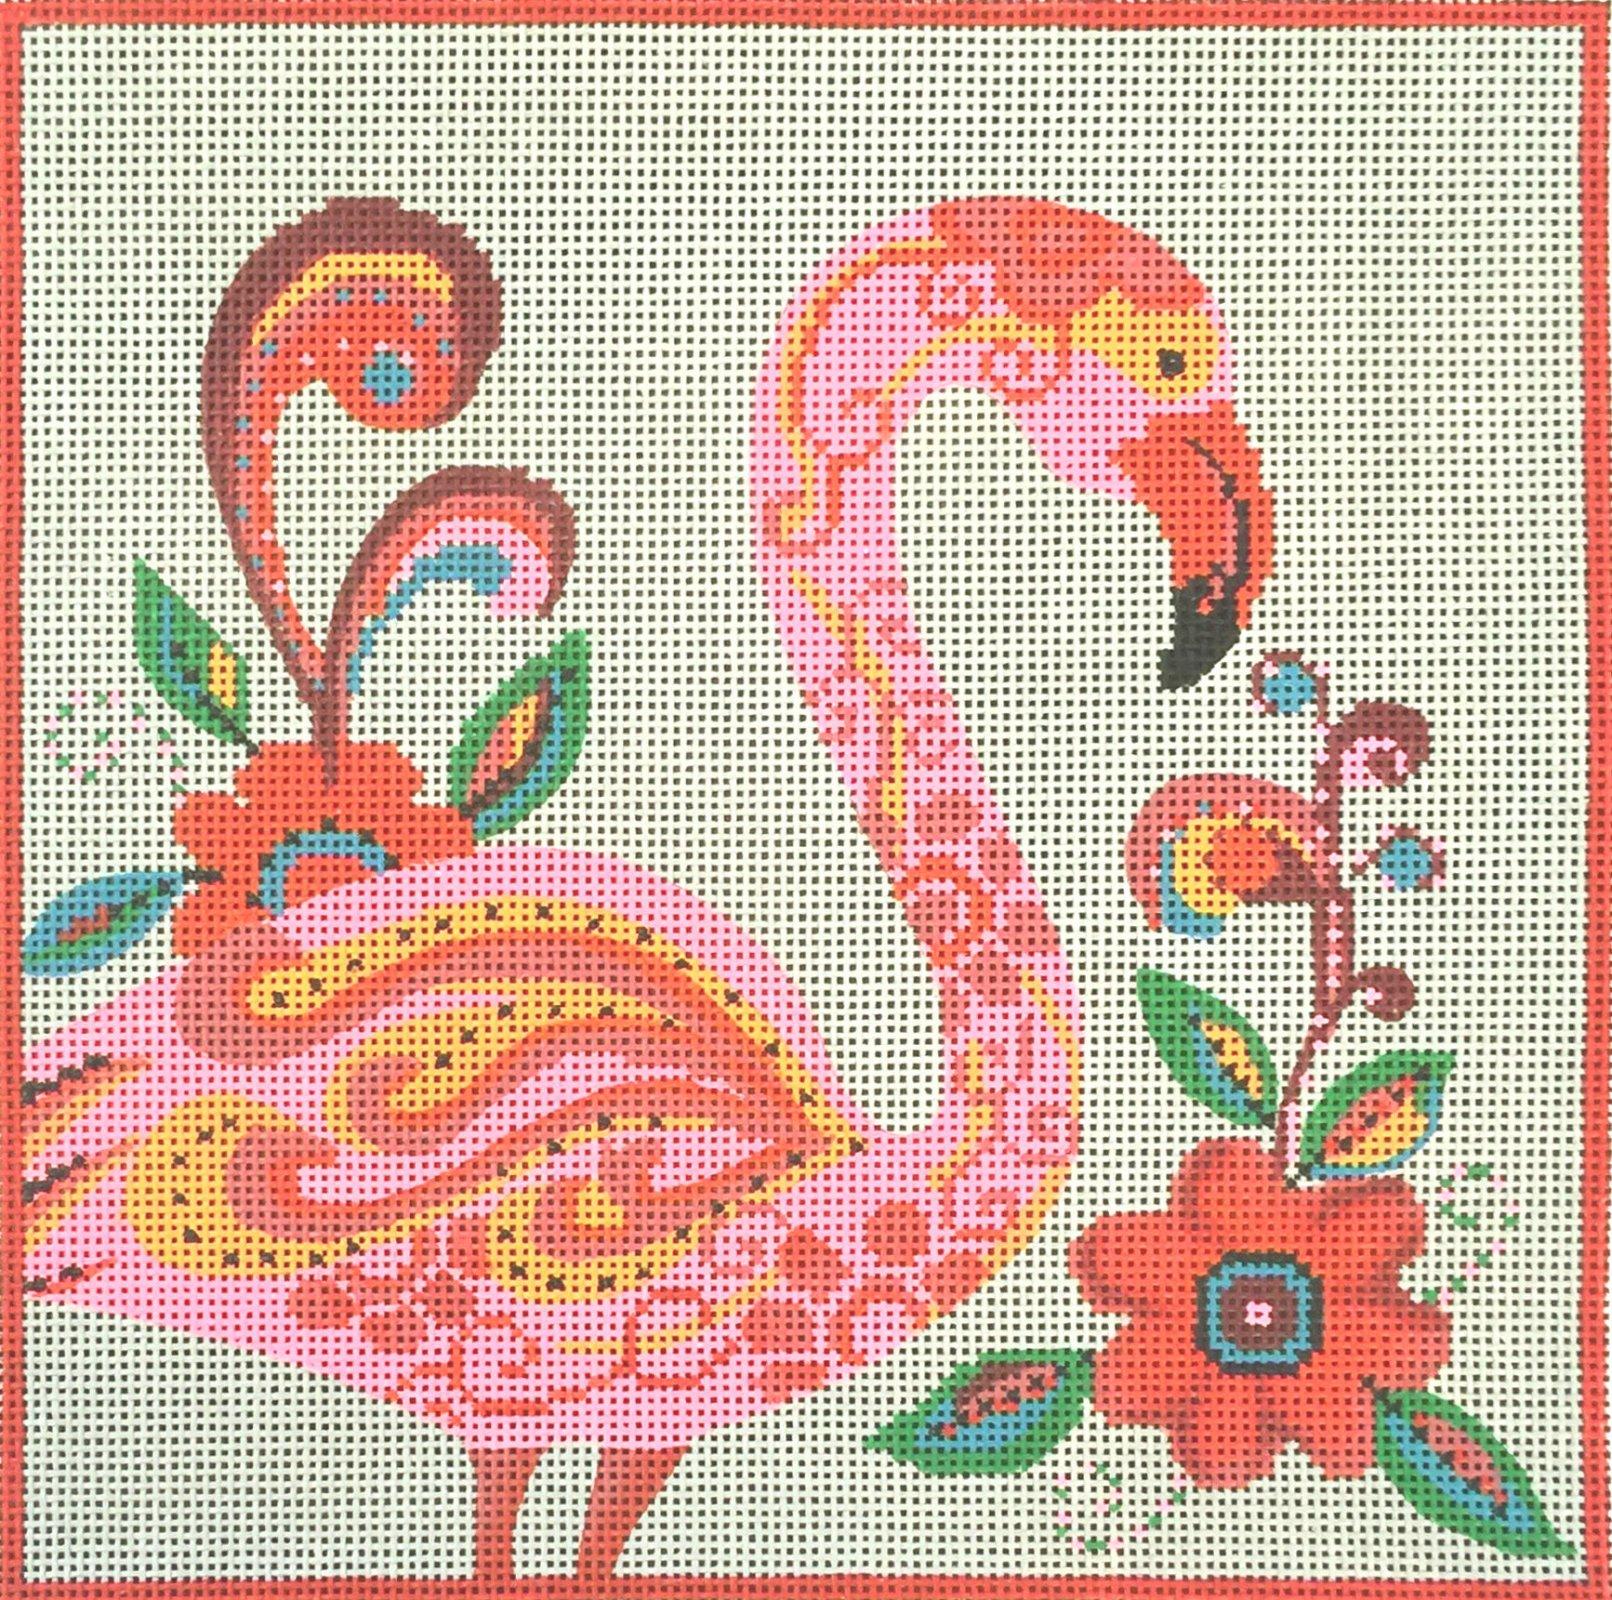 Fancy Flamingo Needlepoint